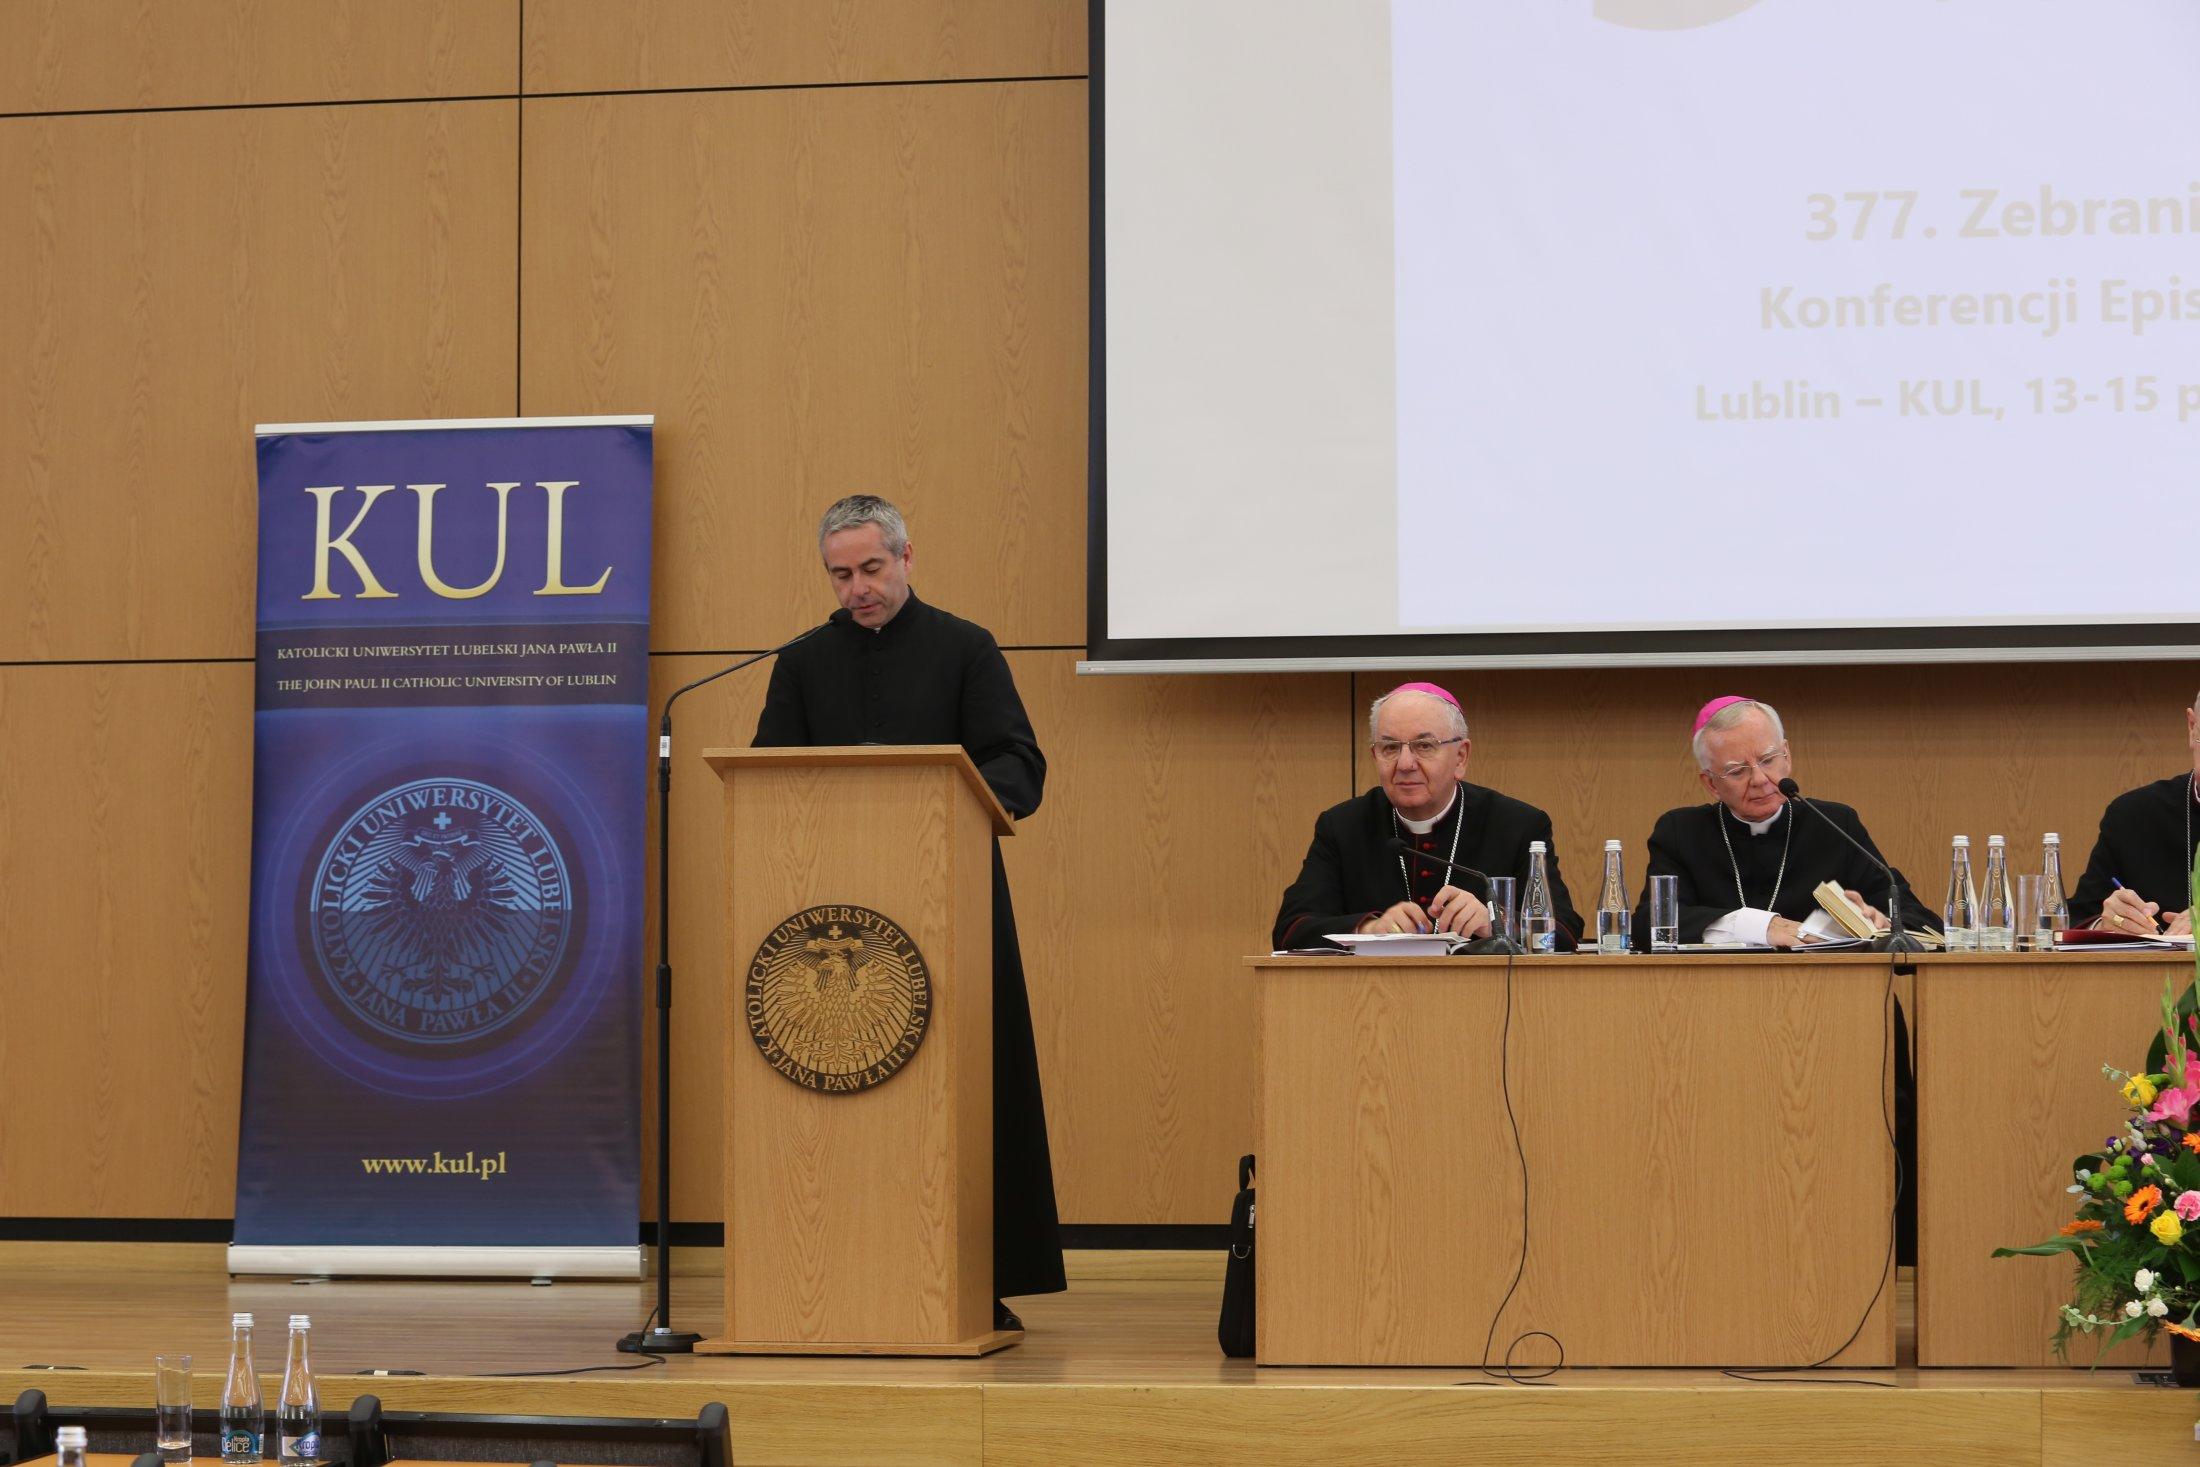 030-wystpienie-ks-marcina-iyckiego-dyrektora-caritas-polska_23817734798_o